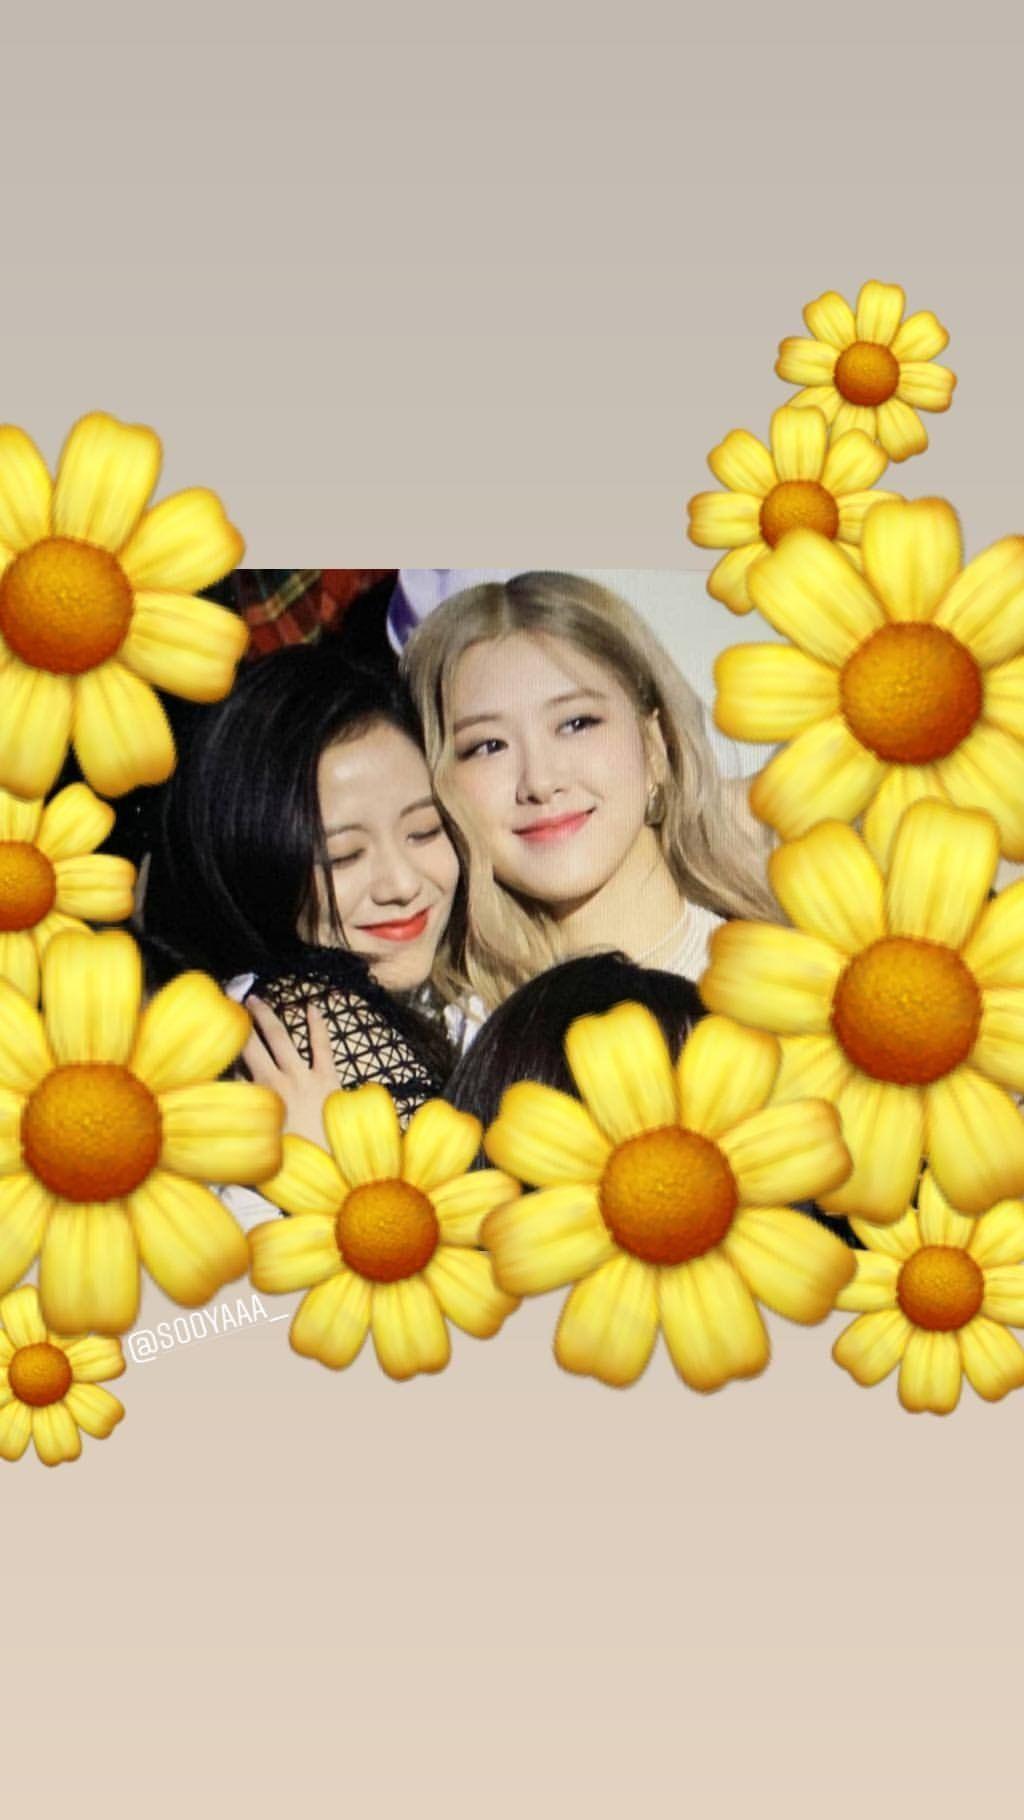 Ig 190124 Both Roses Are Rosie And Sooyaaa Blackpinkofficial Gambar Pengeditan Foto Teman